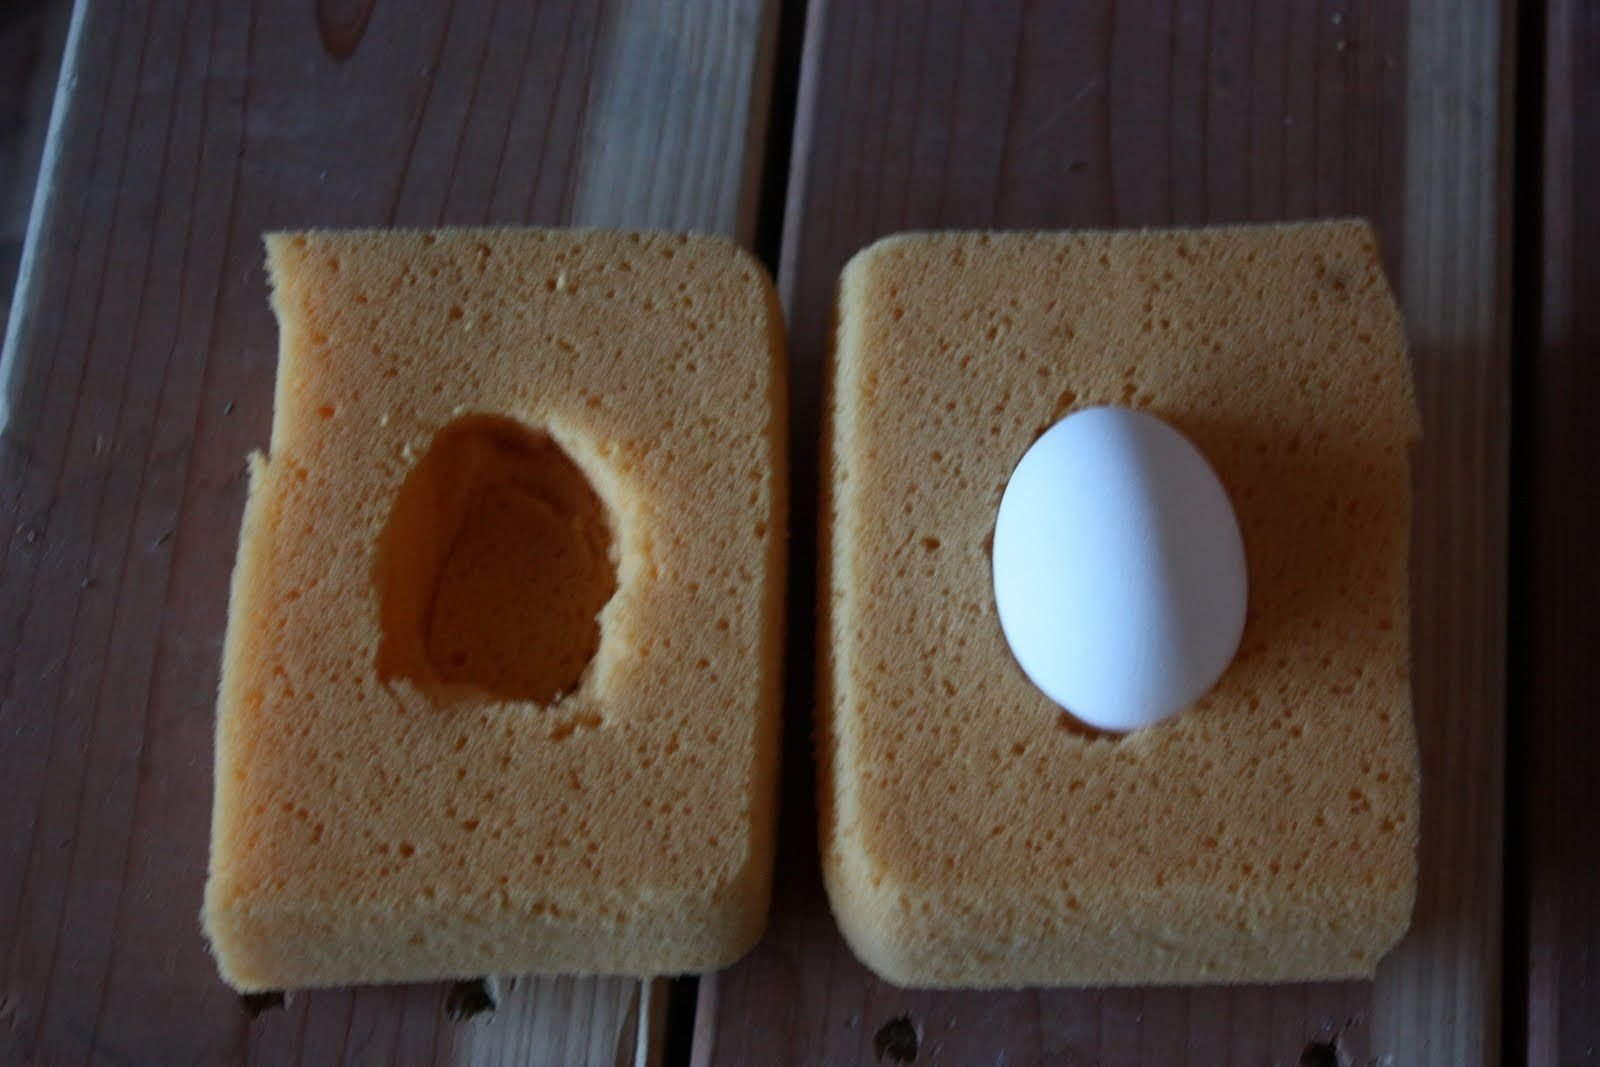 egg drop designs - google search | crafts | pinterest | egg drop